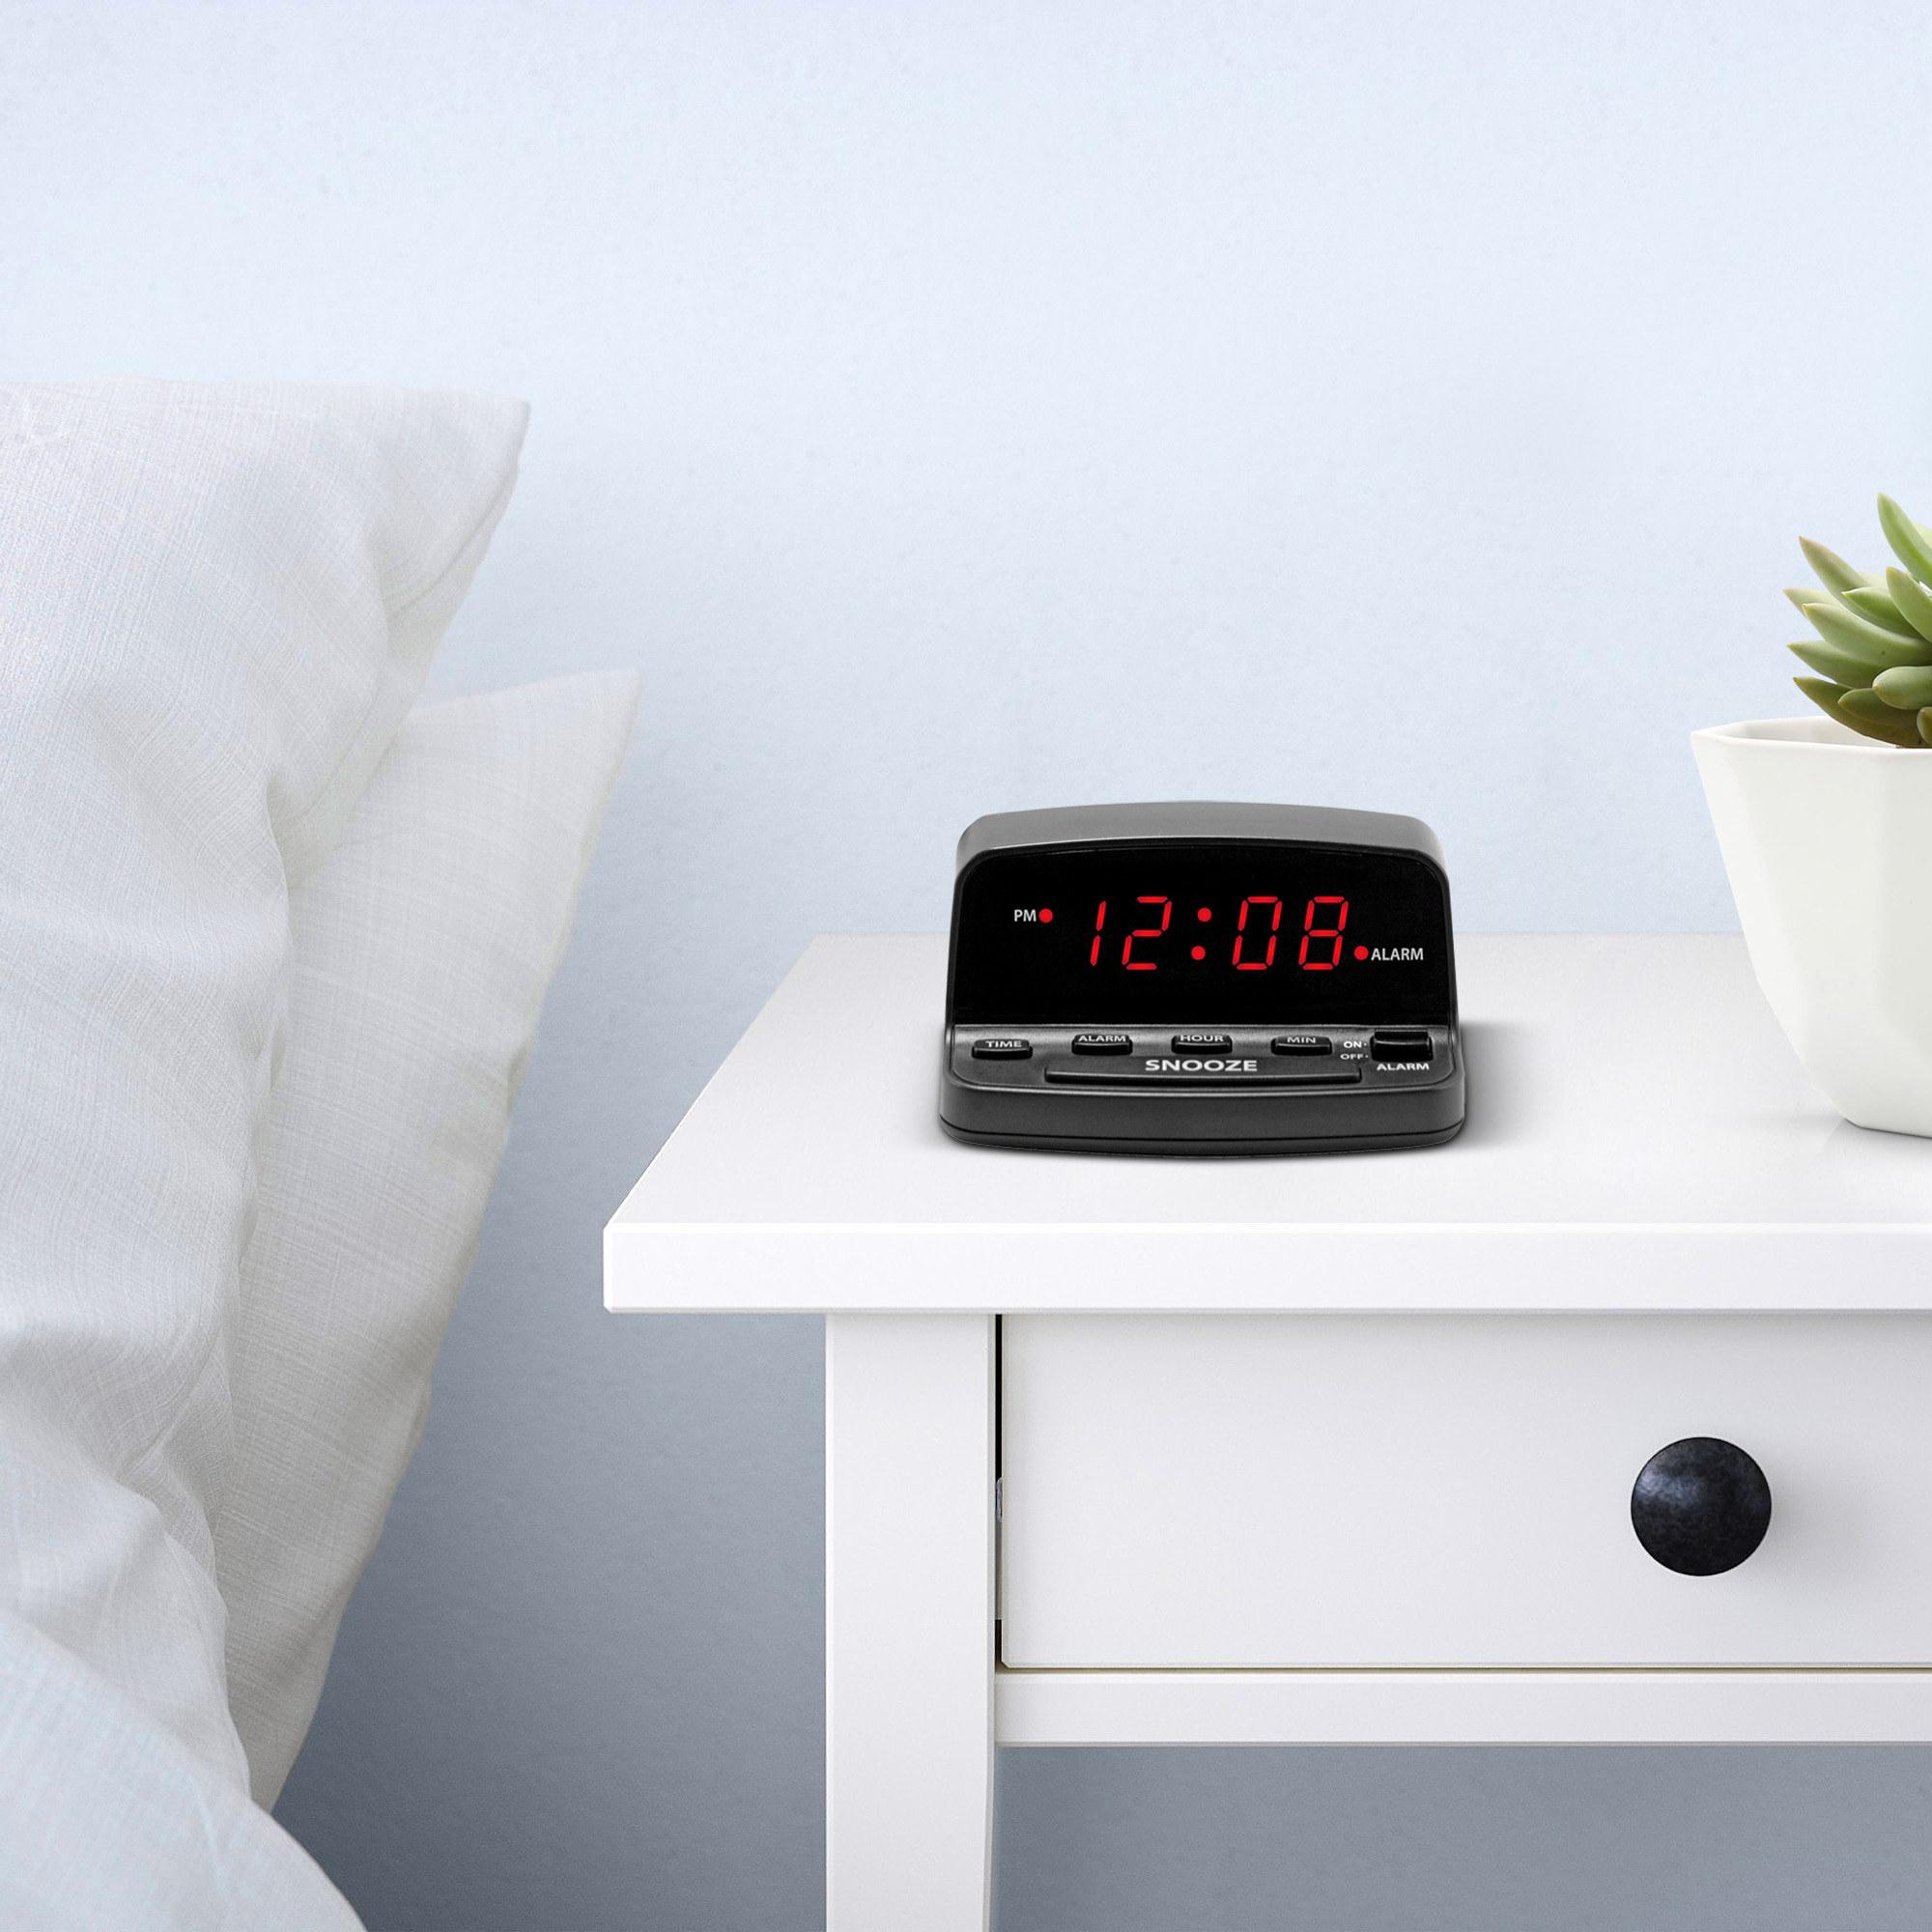 A digital alarm clock in someones home